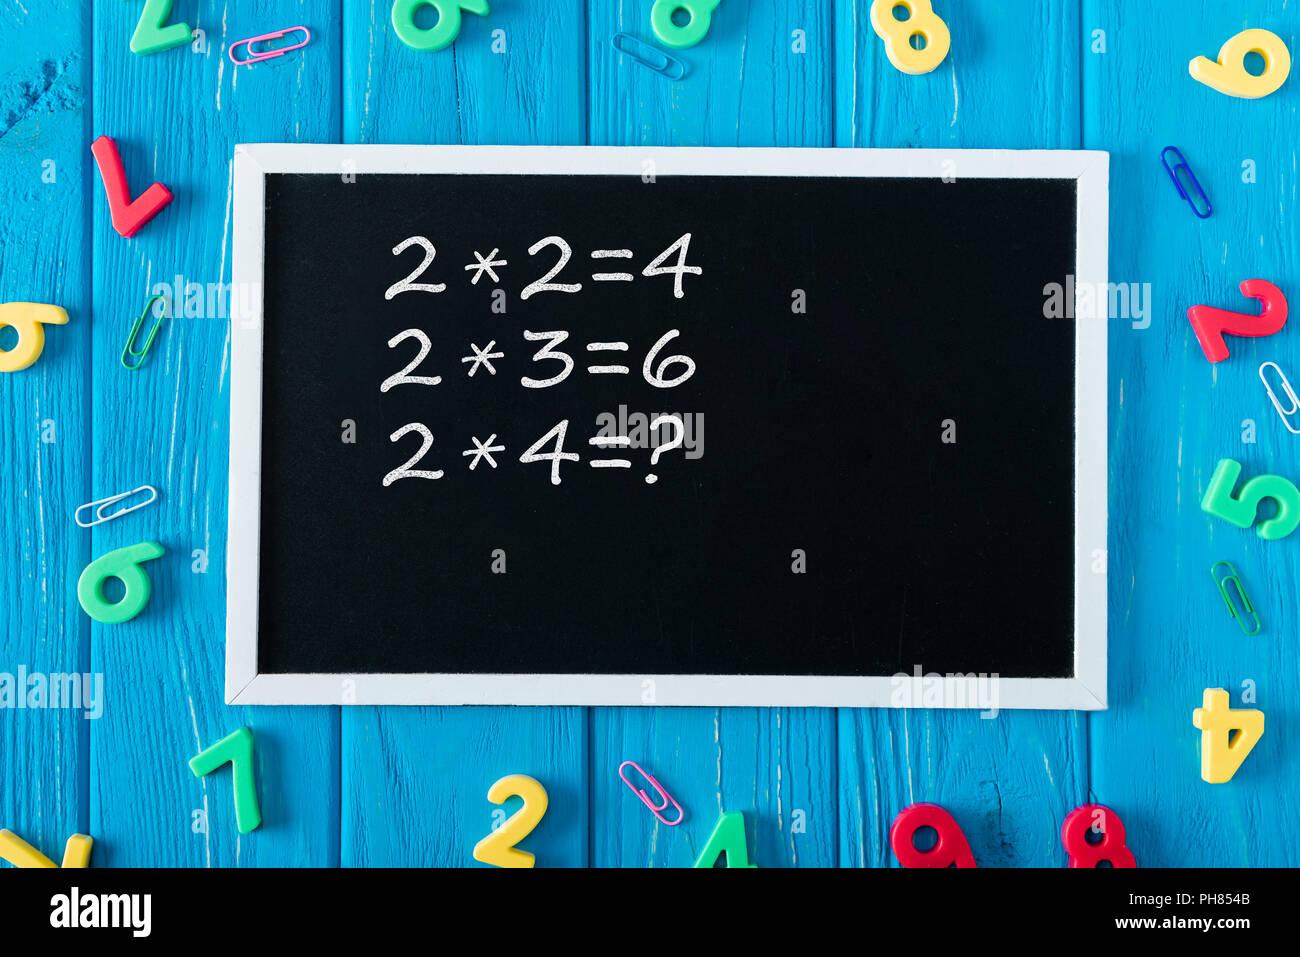 Multiplication Table Stock Photos & Multiplication Table Stock ...